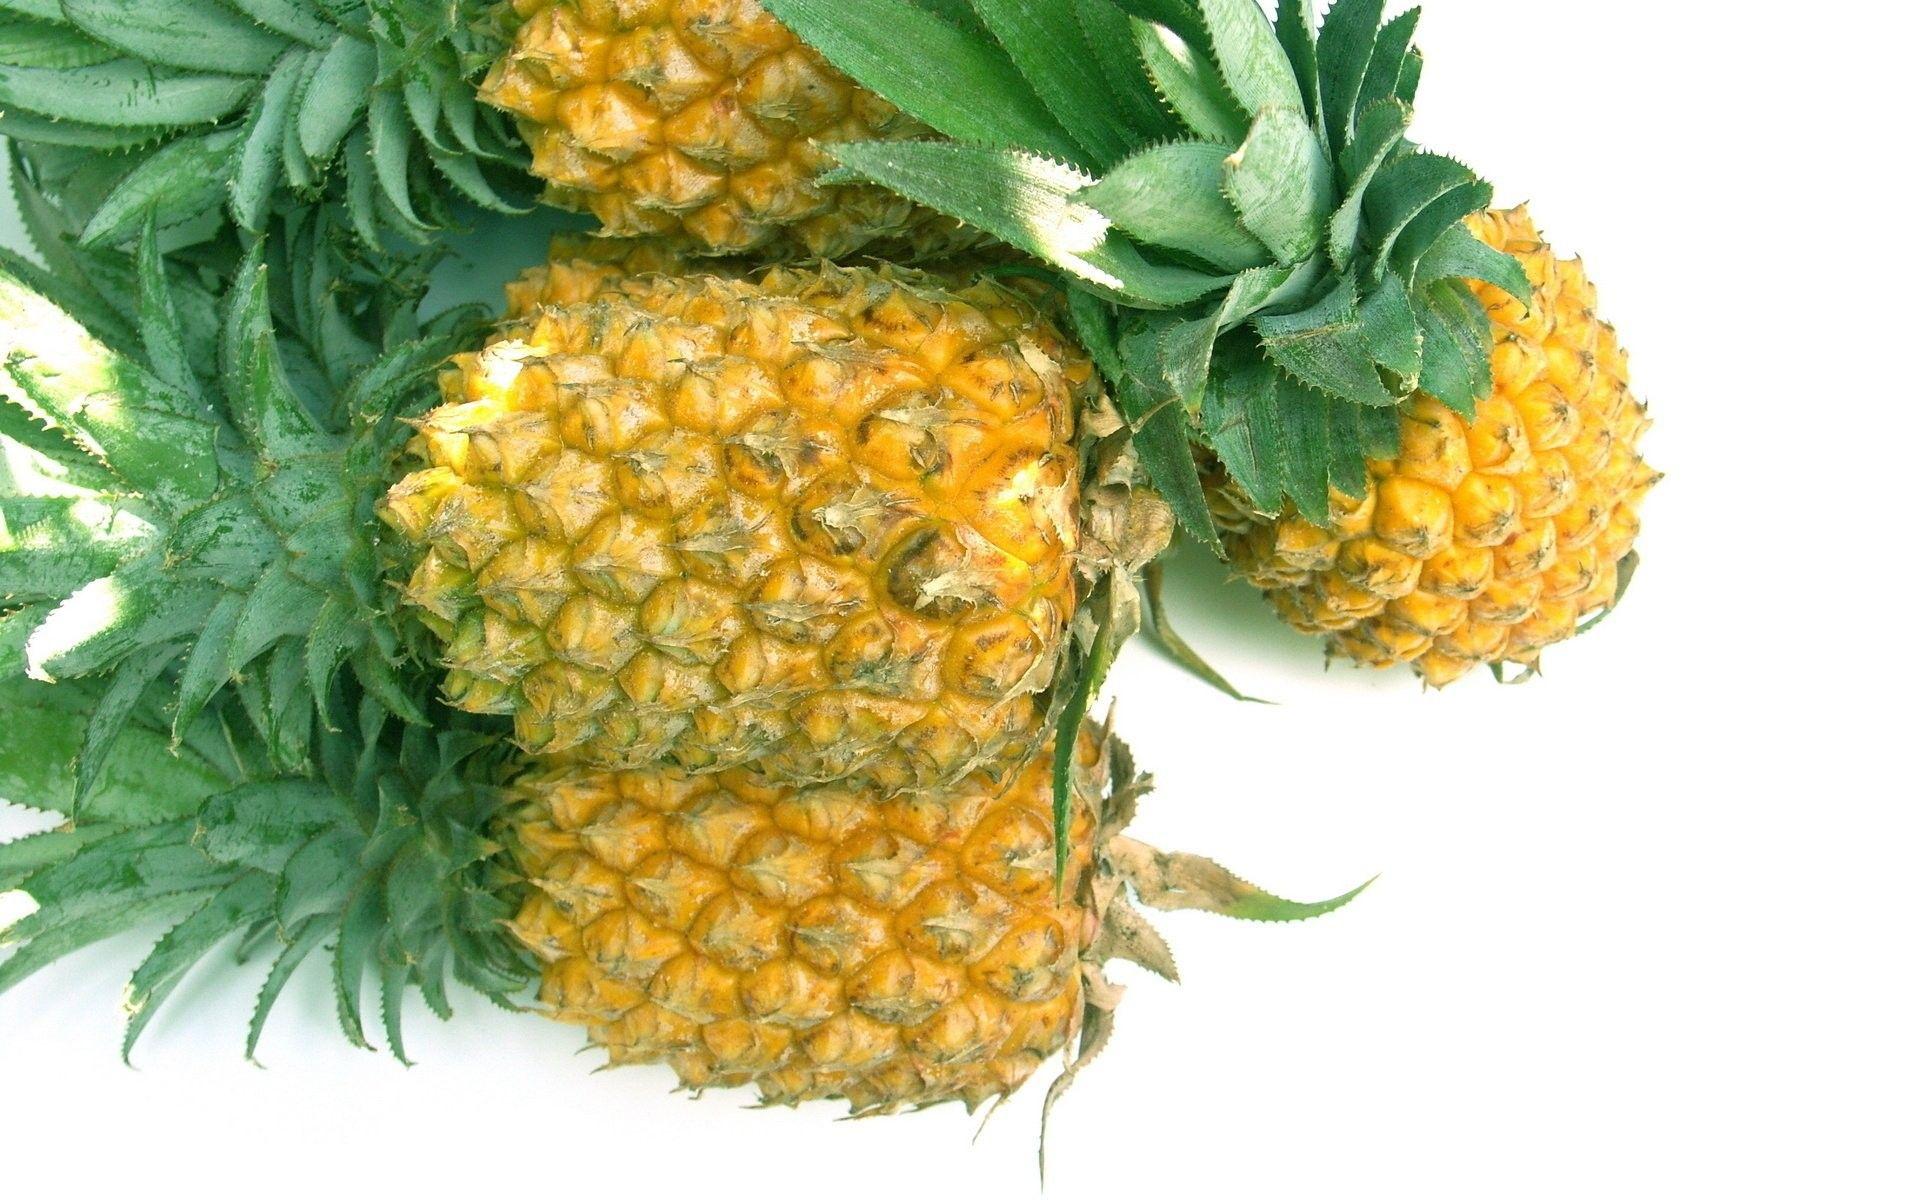 pineapple photograph